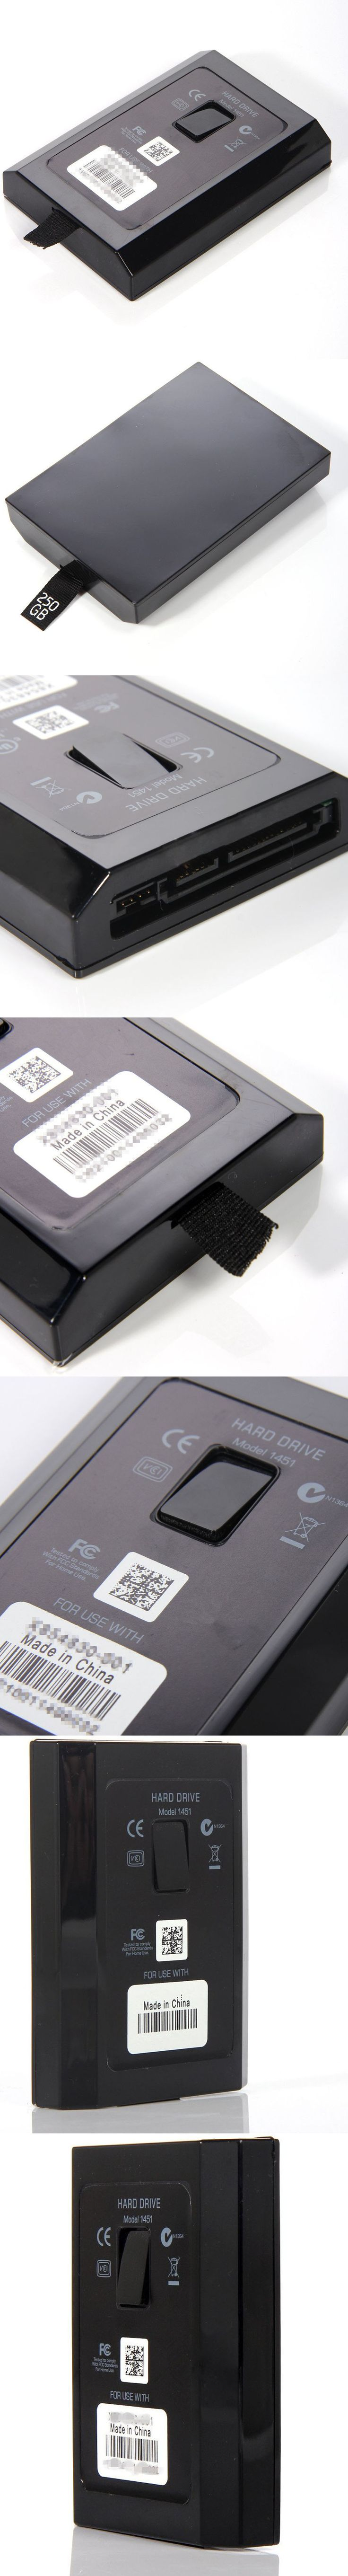 250GB 250G Internal HDD Hard Drive Disk